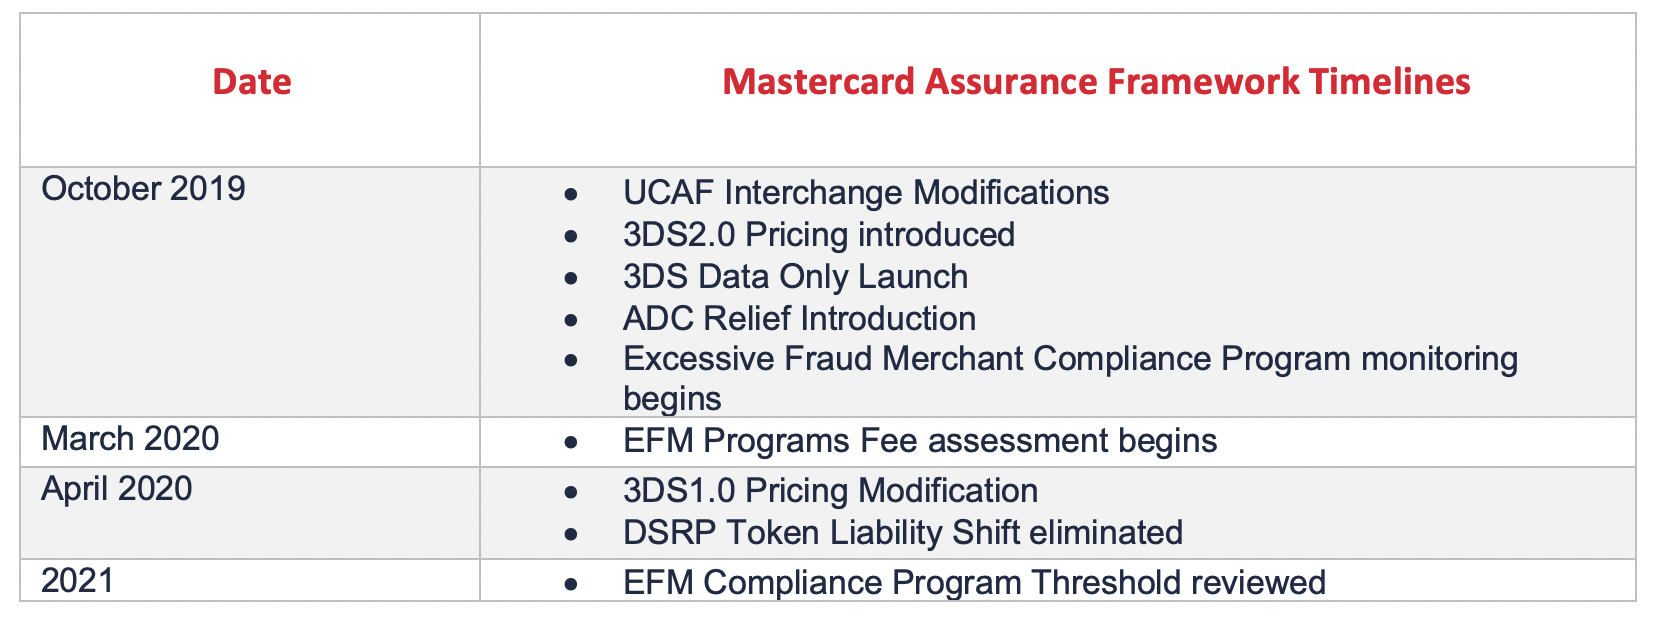 table showing matercard's assurance framework timelines